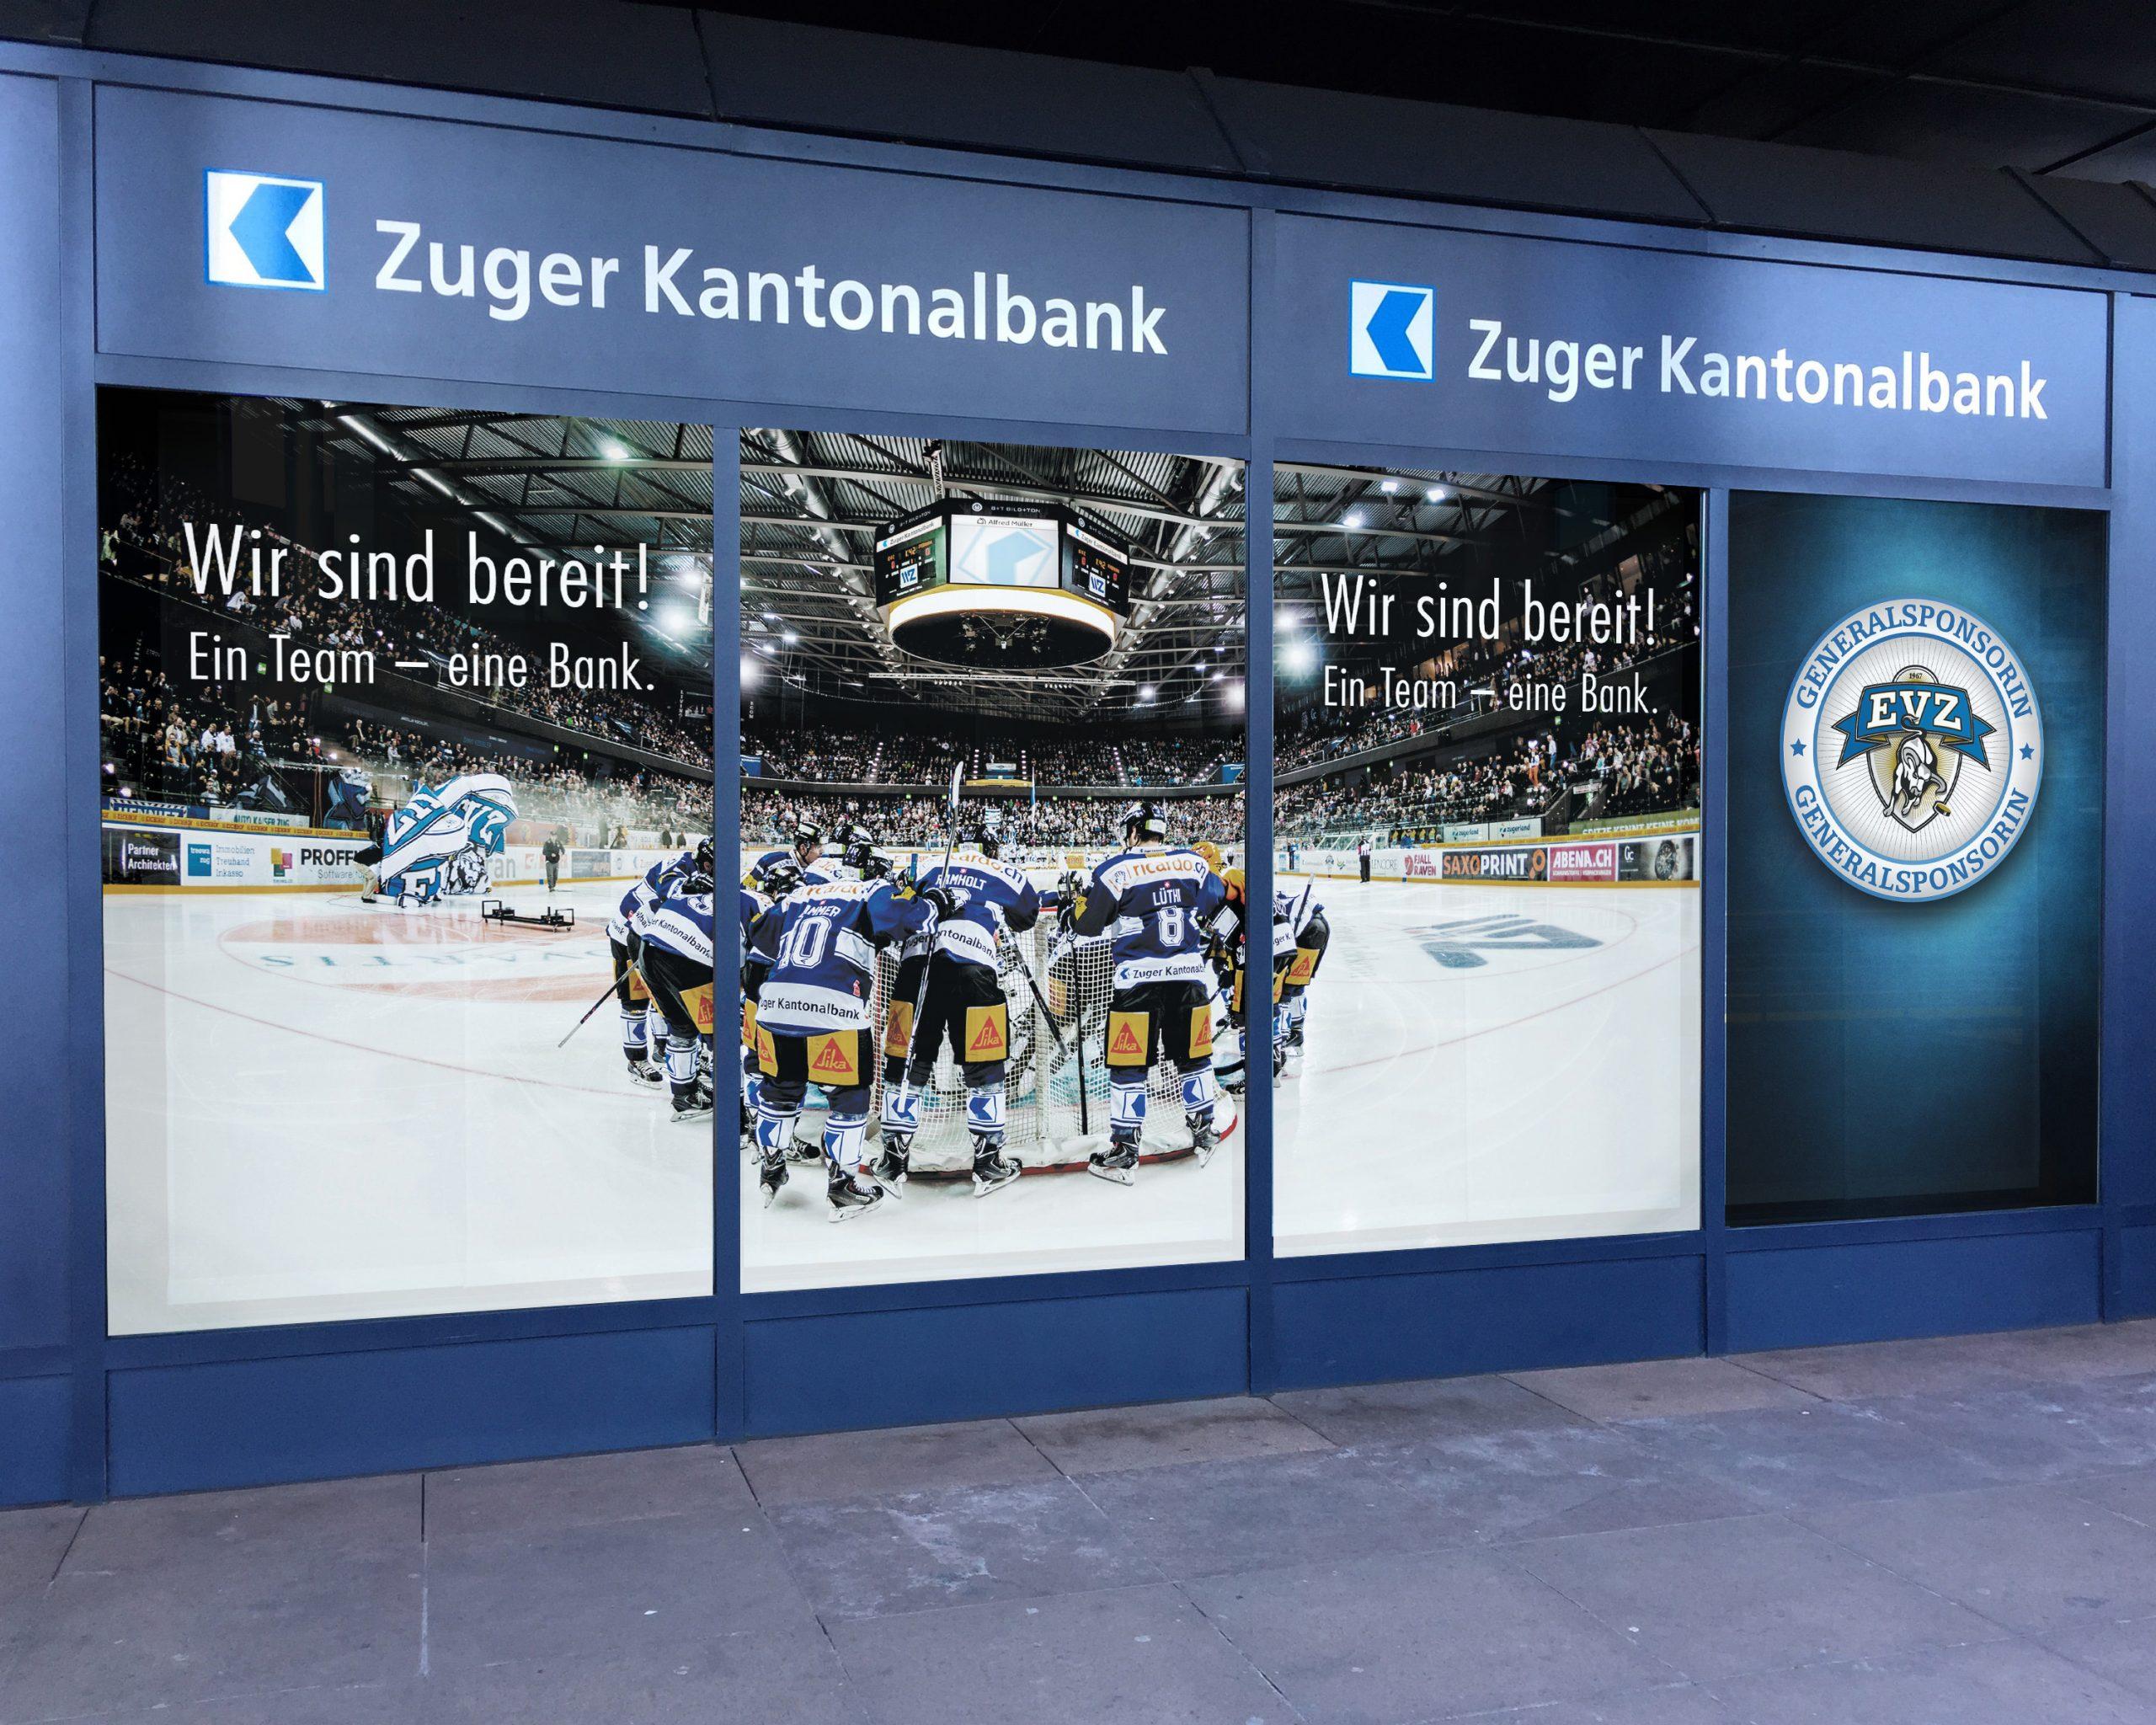 Zuger-Kantonalbank-Agentmedia-03